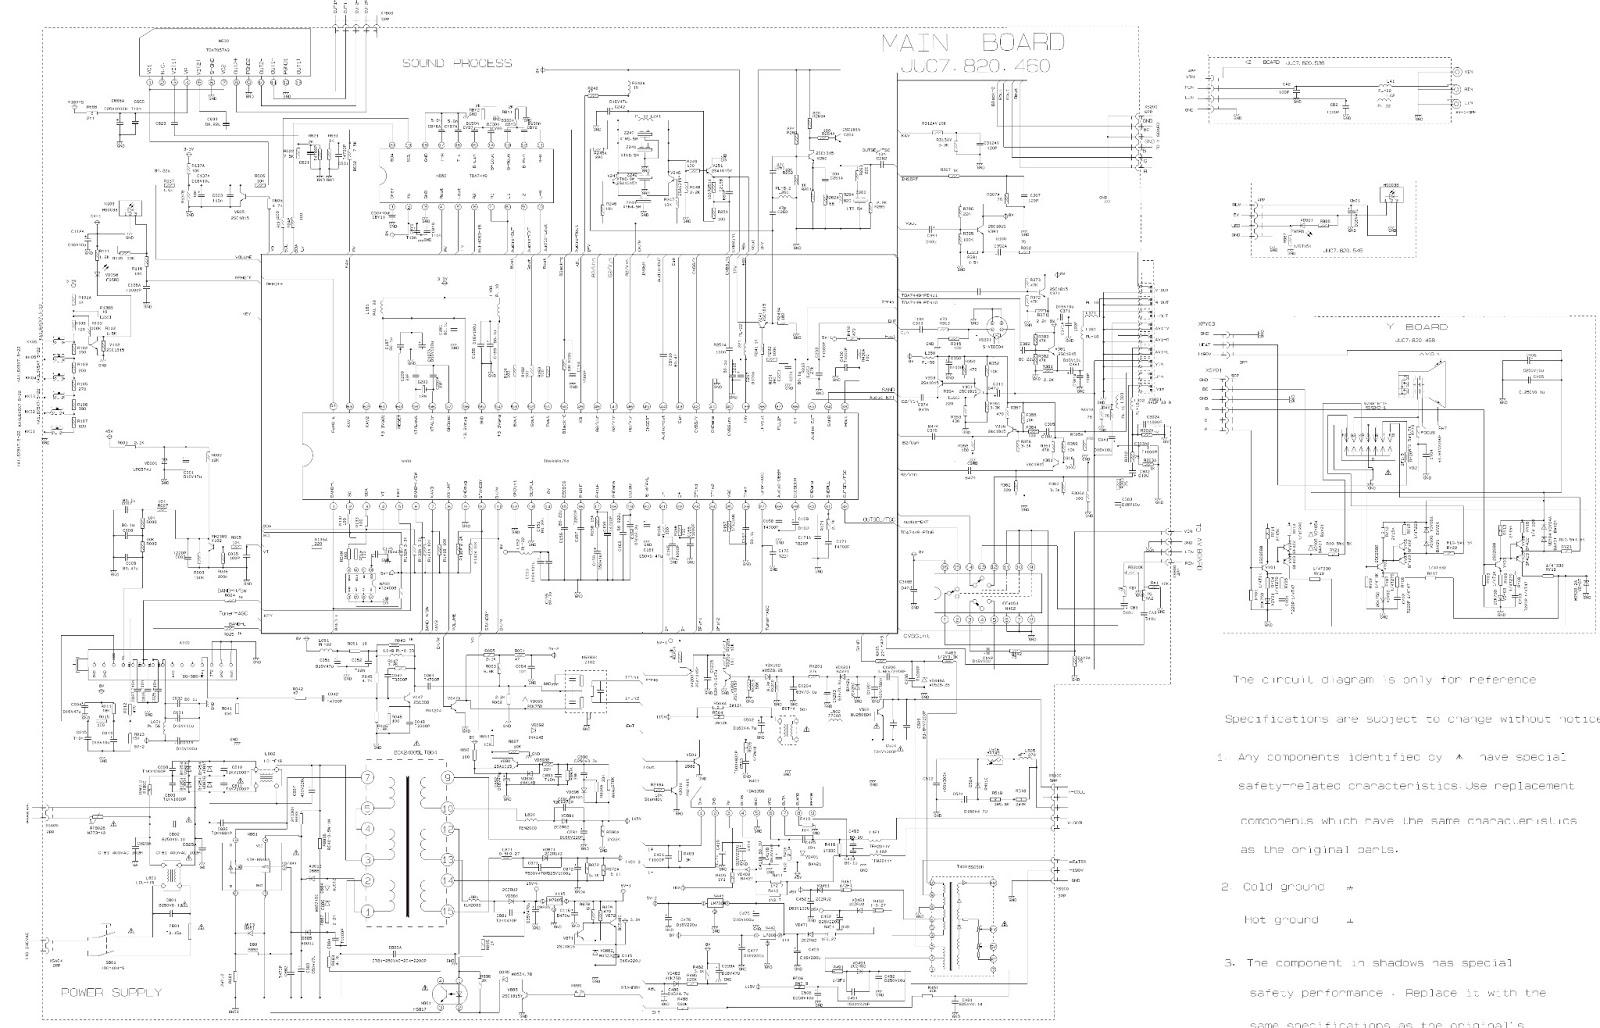 VIDEOCON 21NF55  21PF93  SCHEMATIC DIAGRAM (Circuit